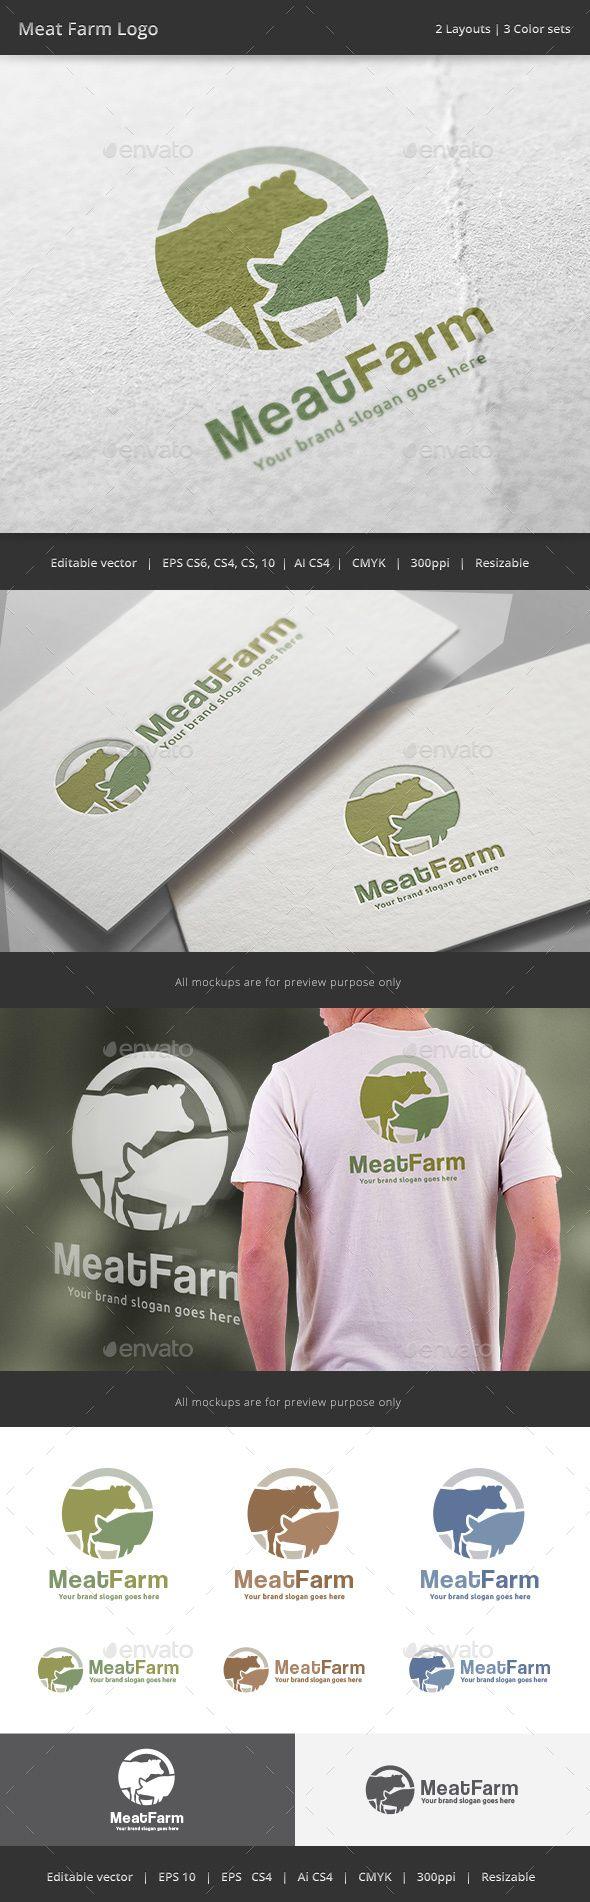 Agri cultures project logo duckdog design - Meat Farm Logo